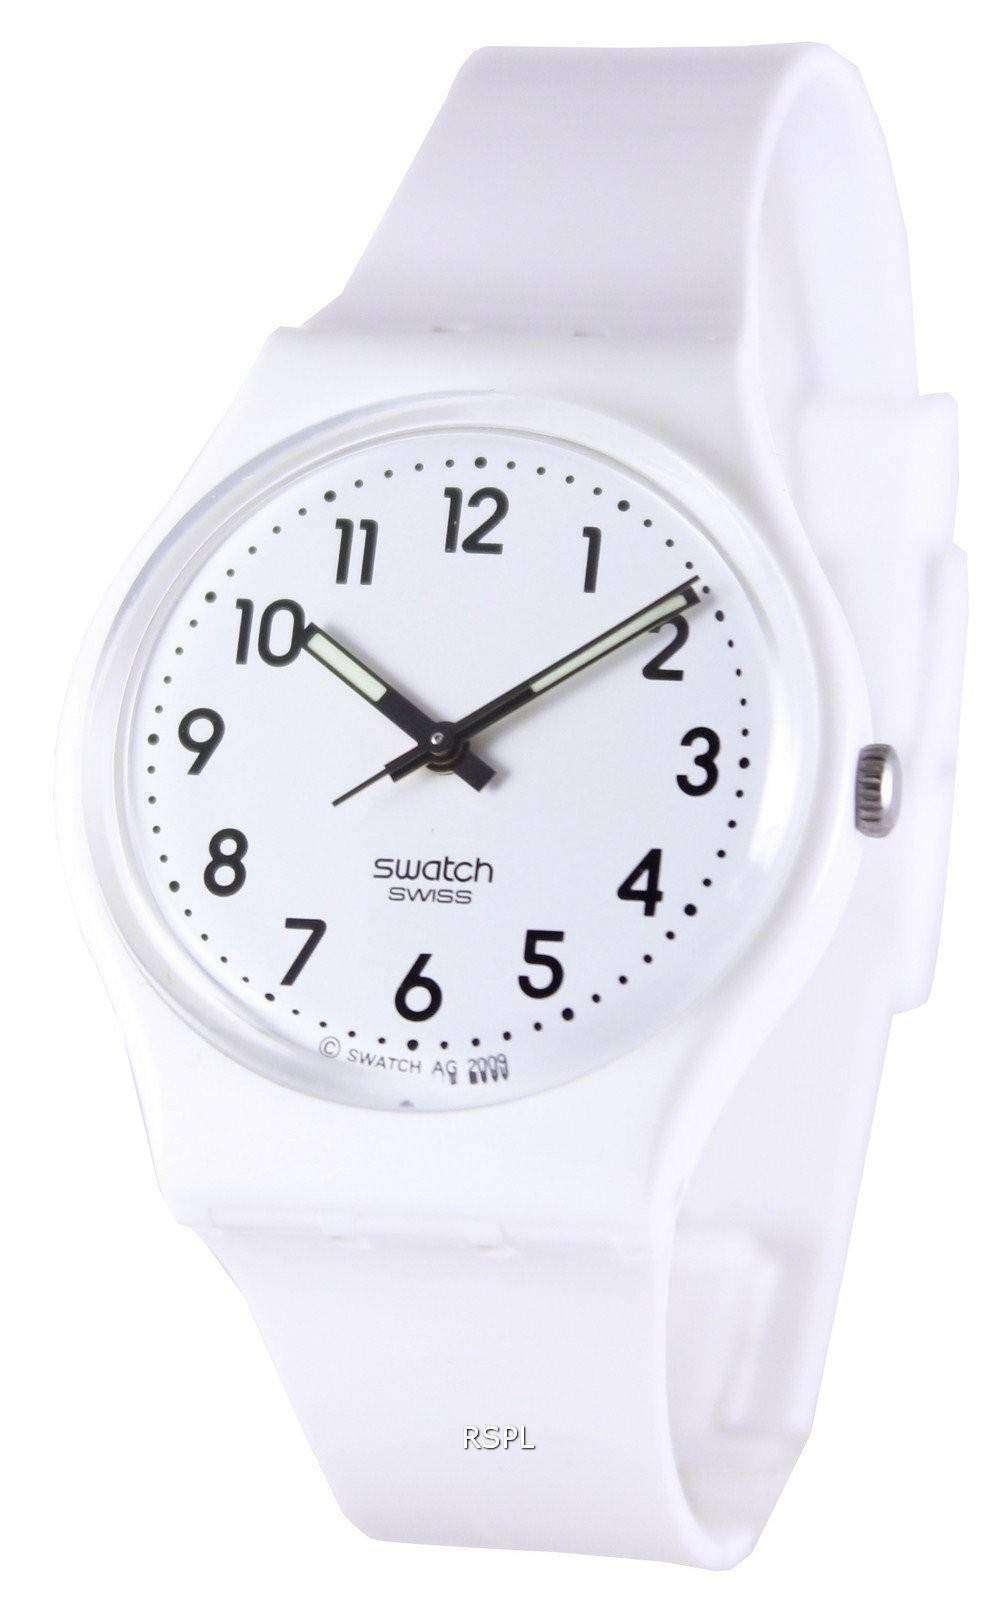 Swatch Original Irony Chrono Watch Strap Aycs Jam Tangan 100  Suts401 Sistem Blue Black Ampamp Just White Swiss Quartz Gw Unisex